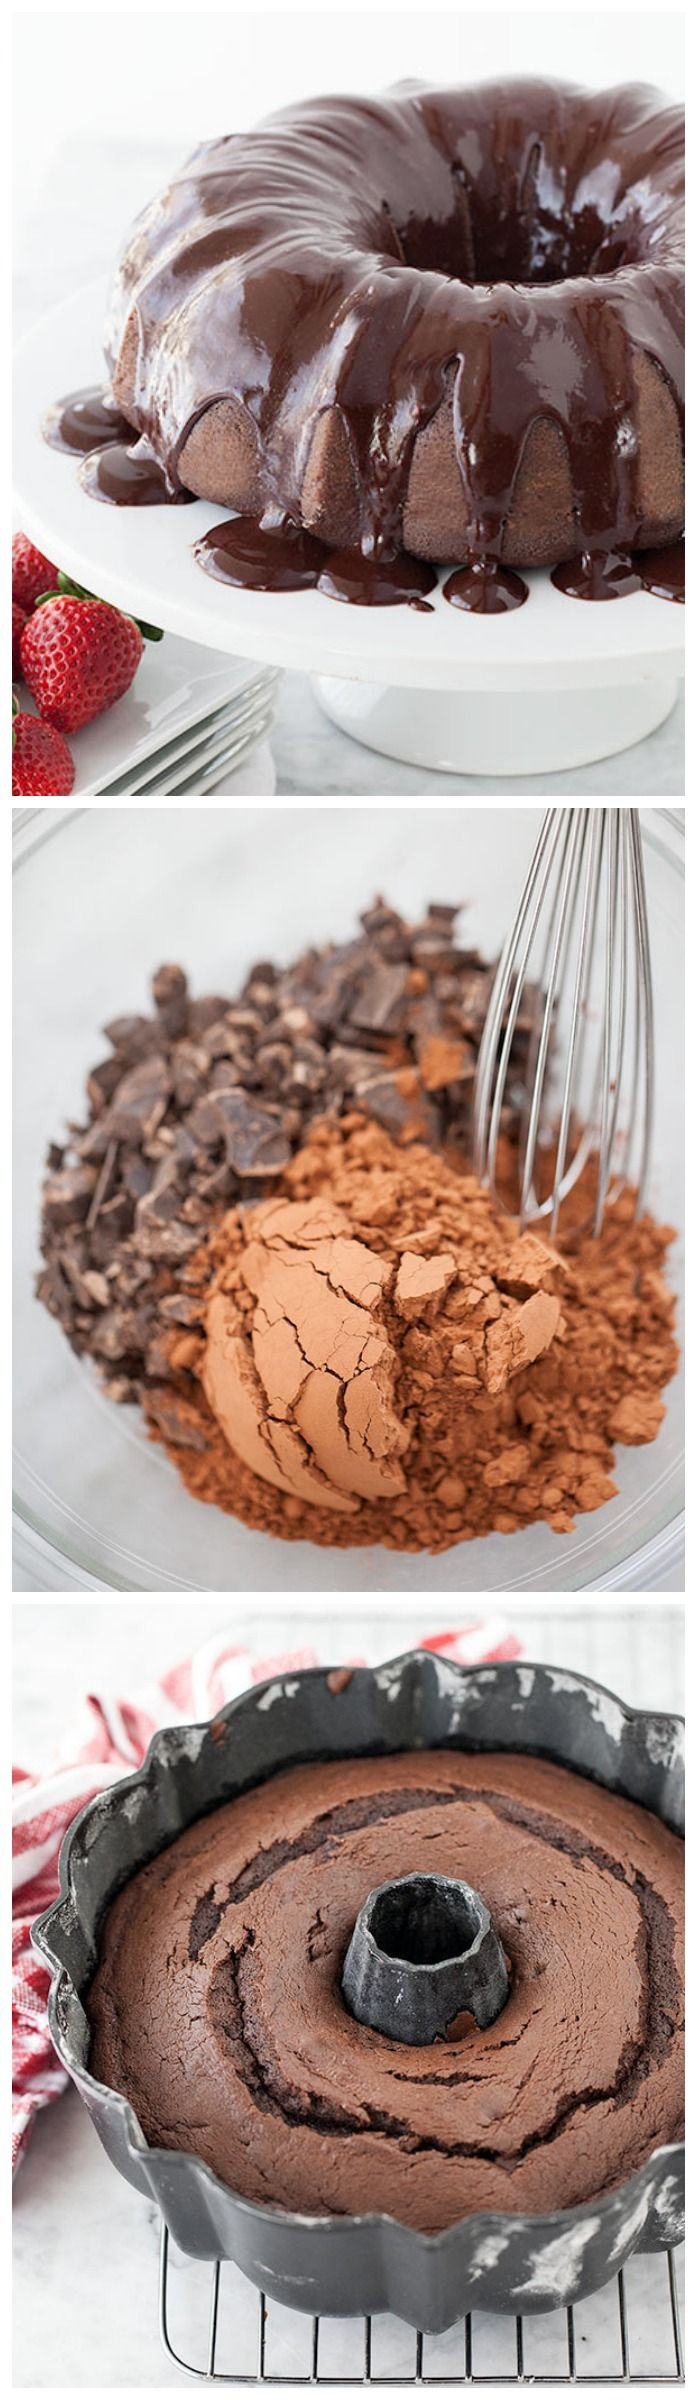 Devil's Food Bundt Cake with Espresso Ganache Glaze cures every chocolate craving on foodiecrush.com #recipe #dessert #cake